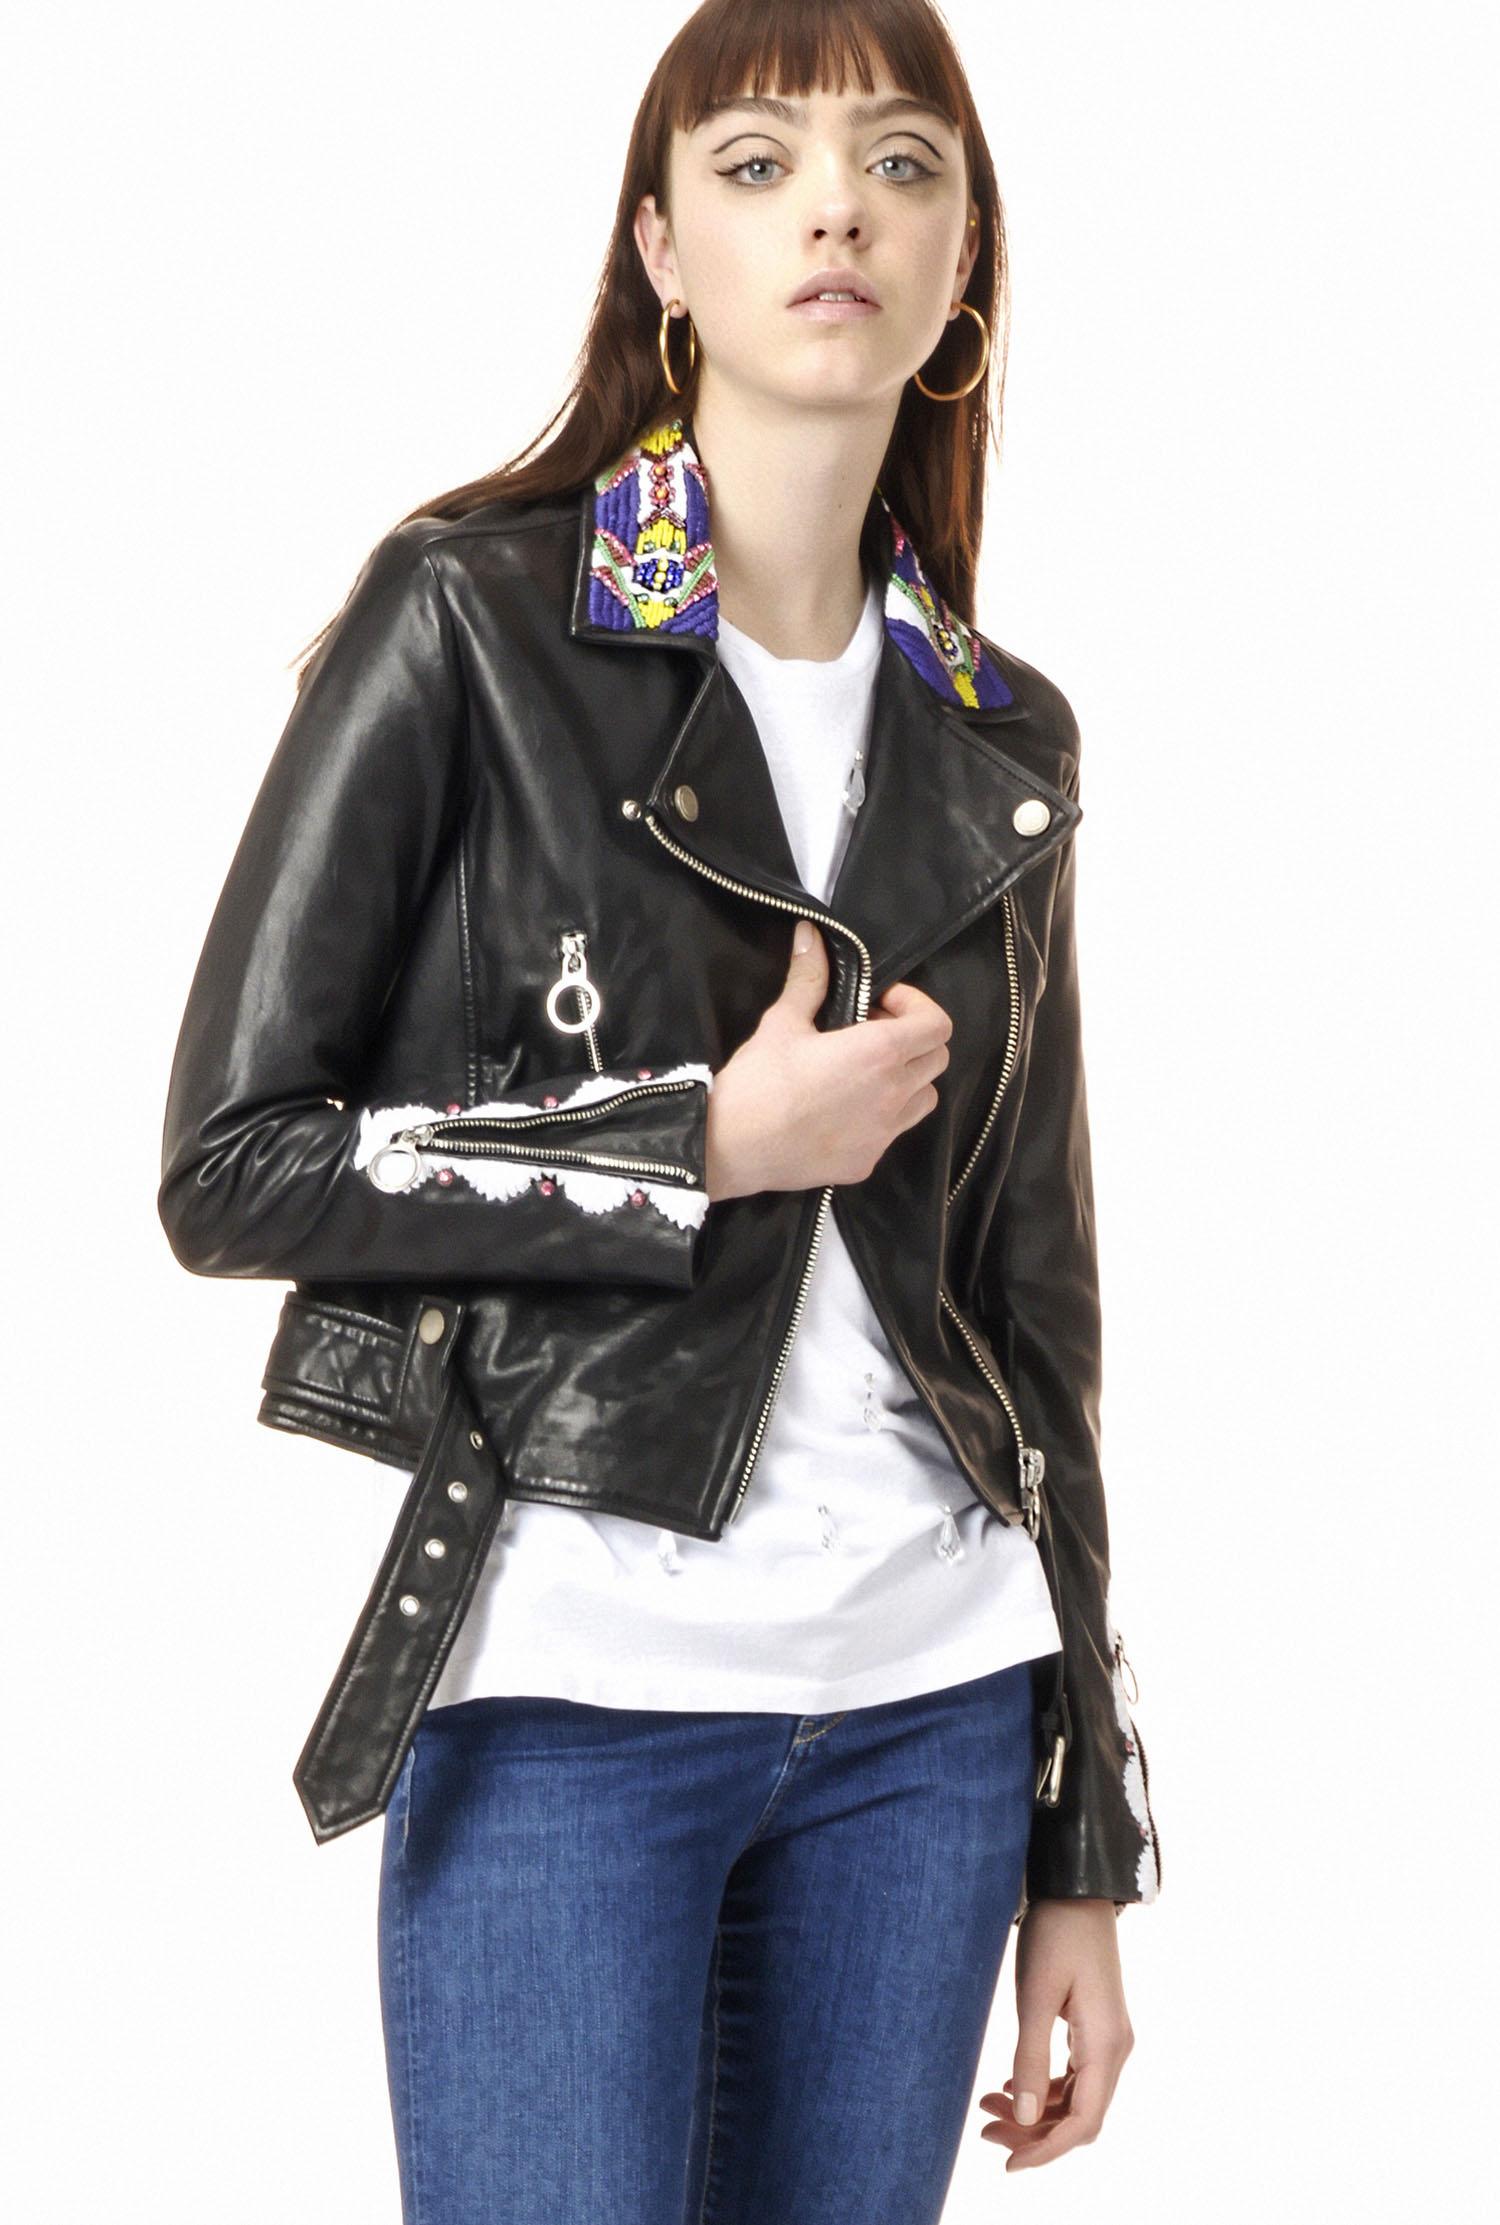 967b7bdb0e7 PINKO Spring-Summer 2018 women's leather biker jacket